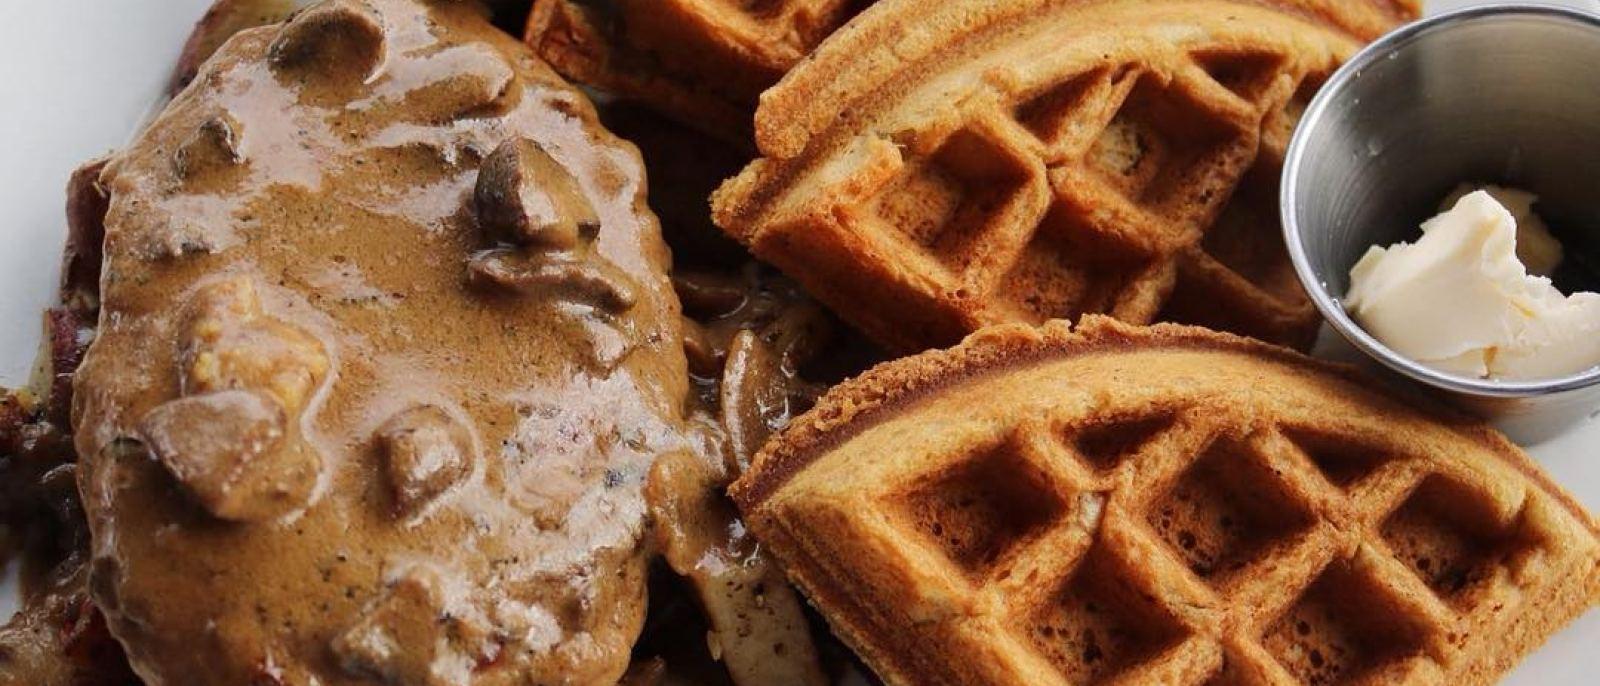 """Chicken"" & Waffles at Flore Vegan Cuisine | Photo: @imlilymedina, Instagram"